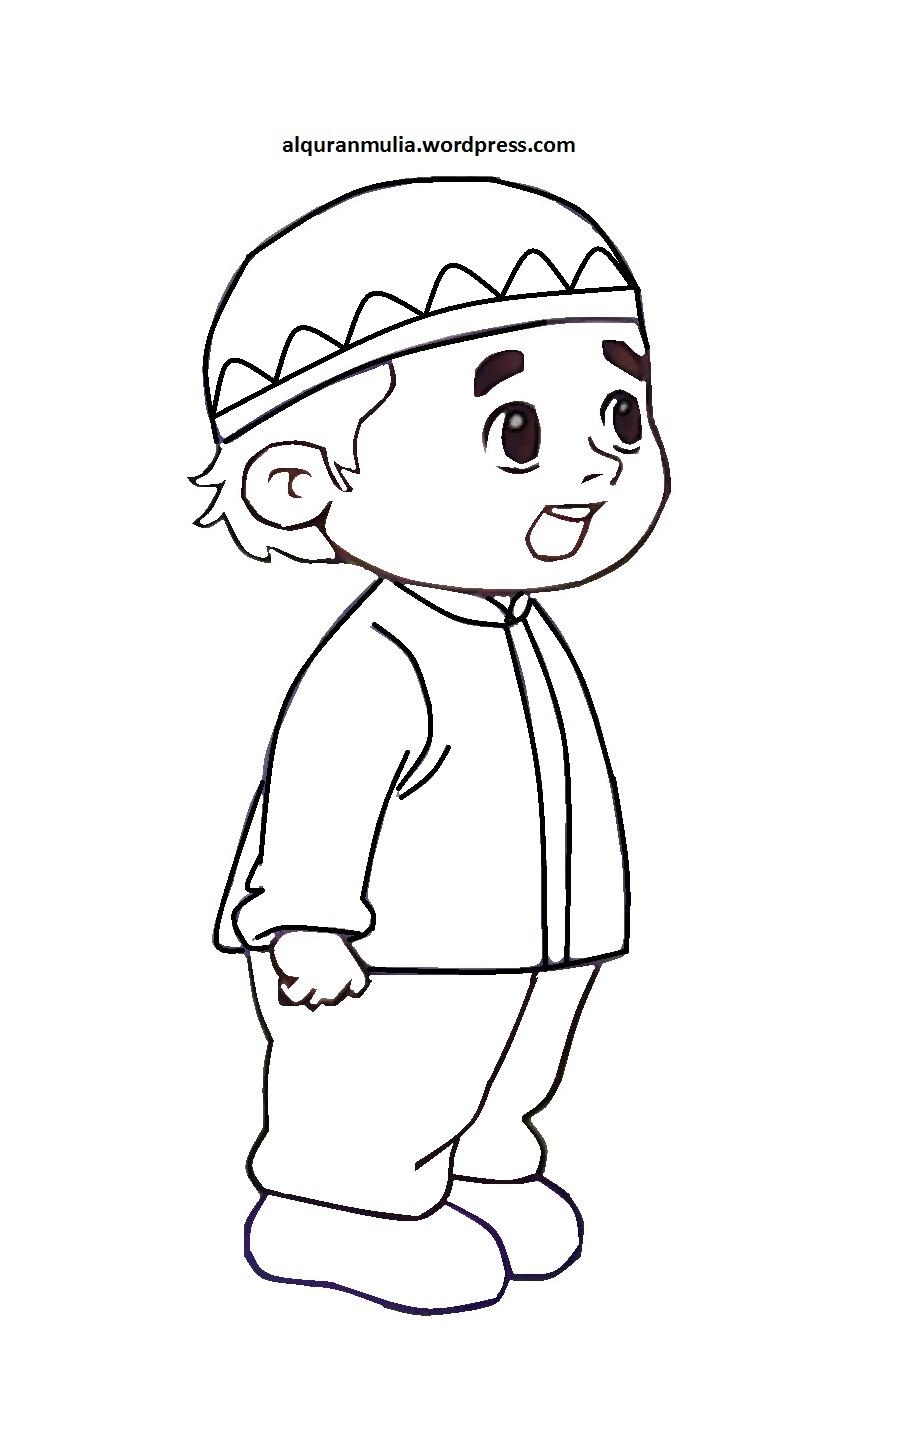 Download Gambar Kartun Ana Muslim Mewarnai